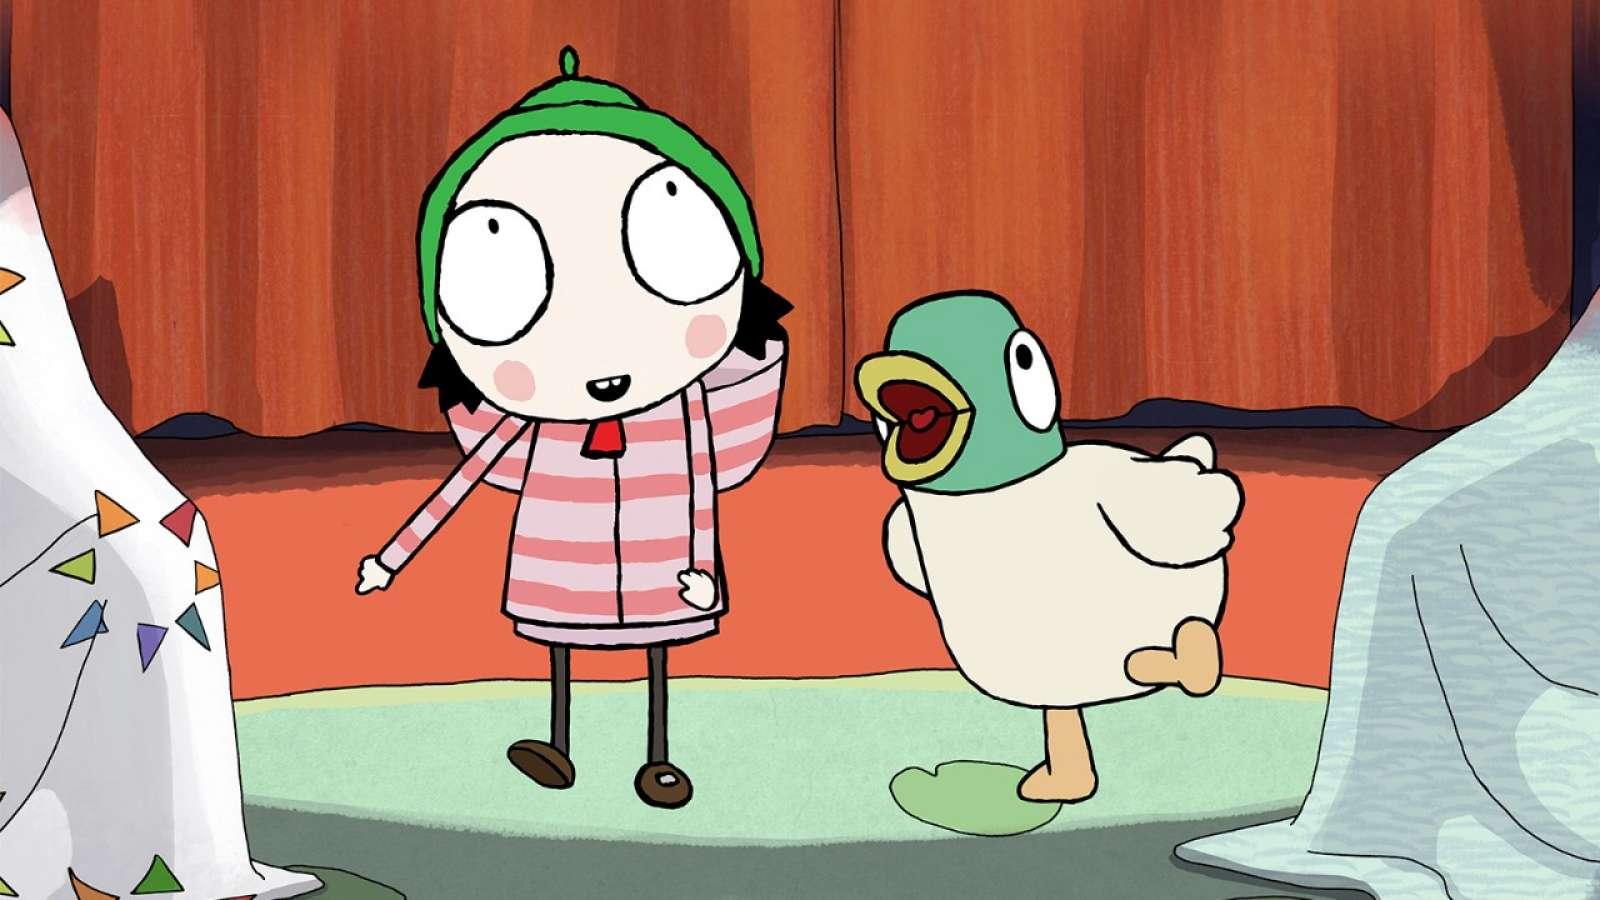 Sarah-Duck-Online-SOH-1600x900.jpg.image.1600.900.high.jpg